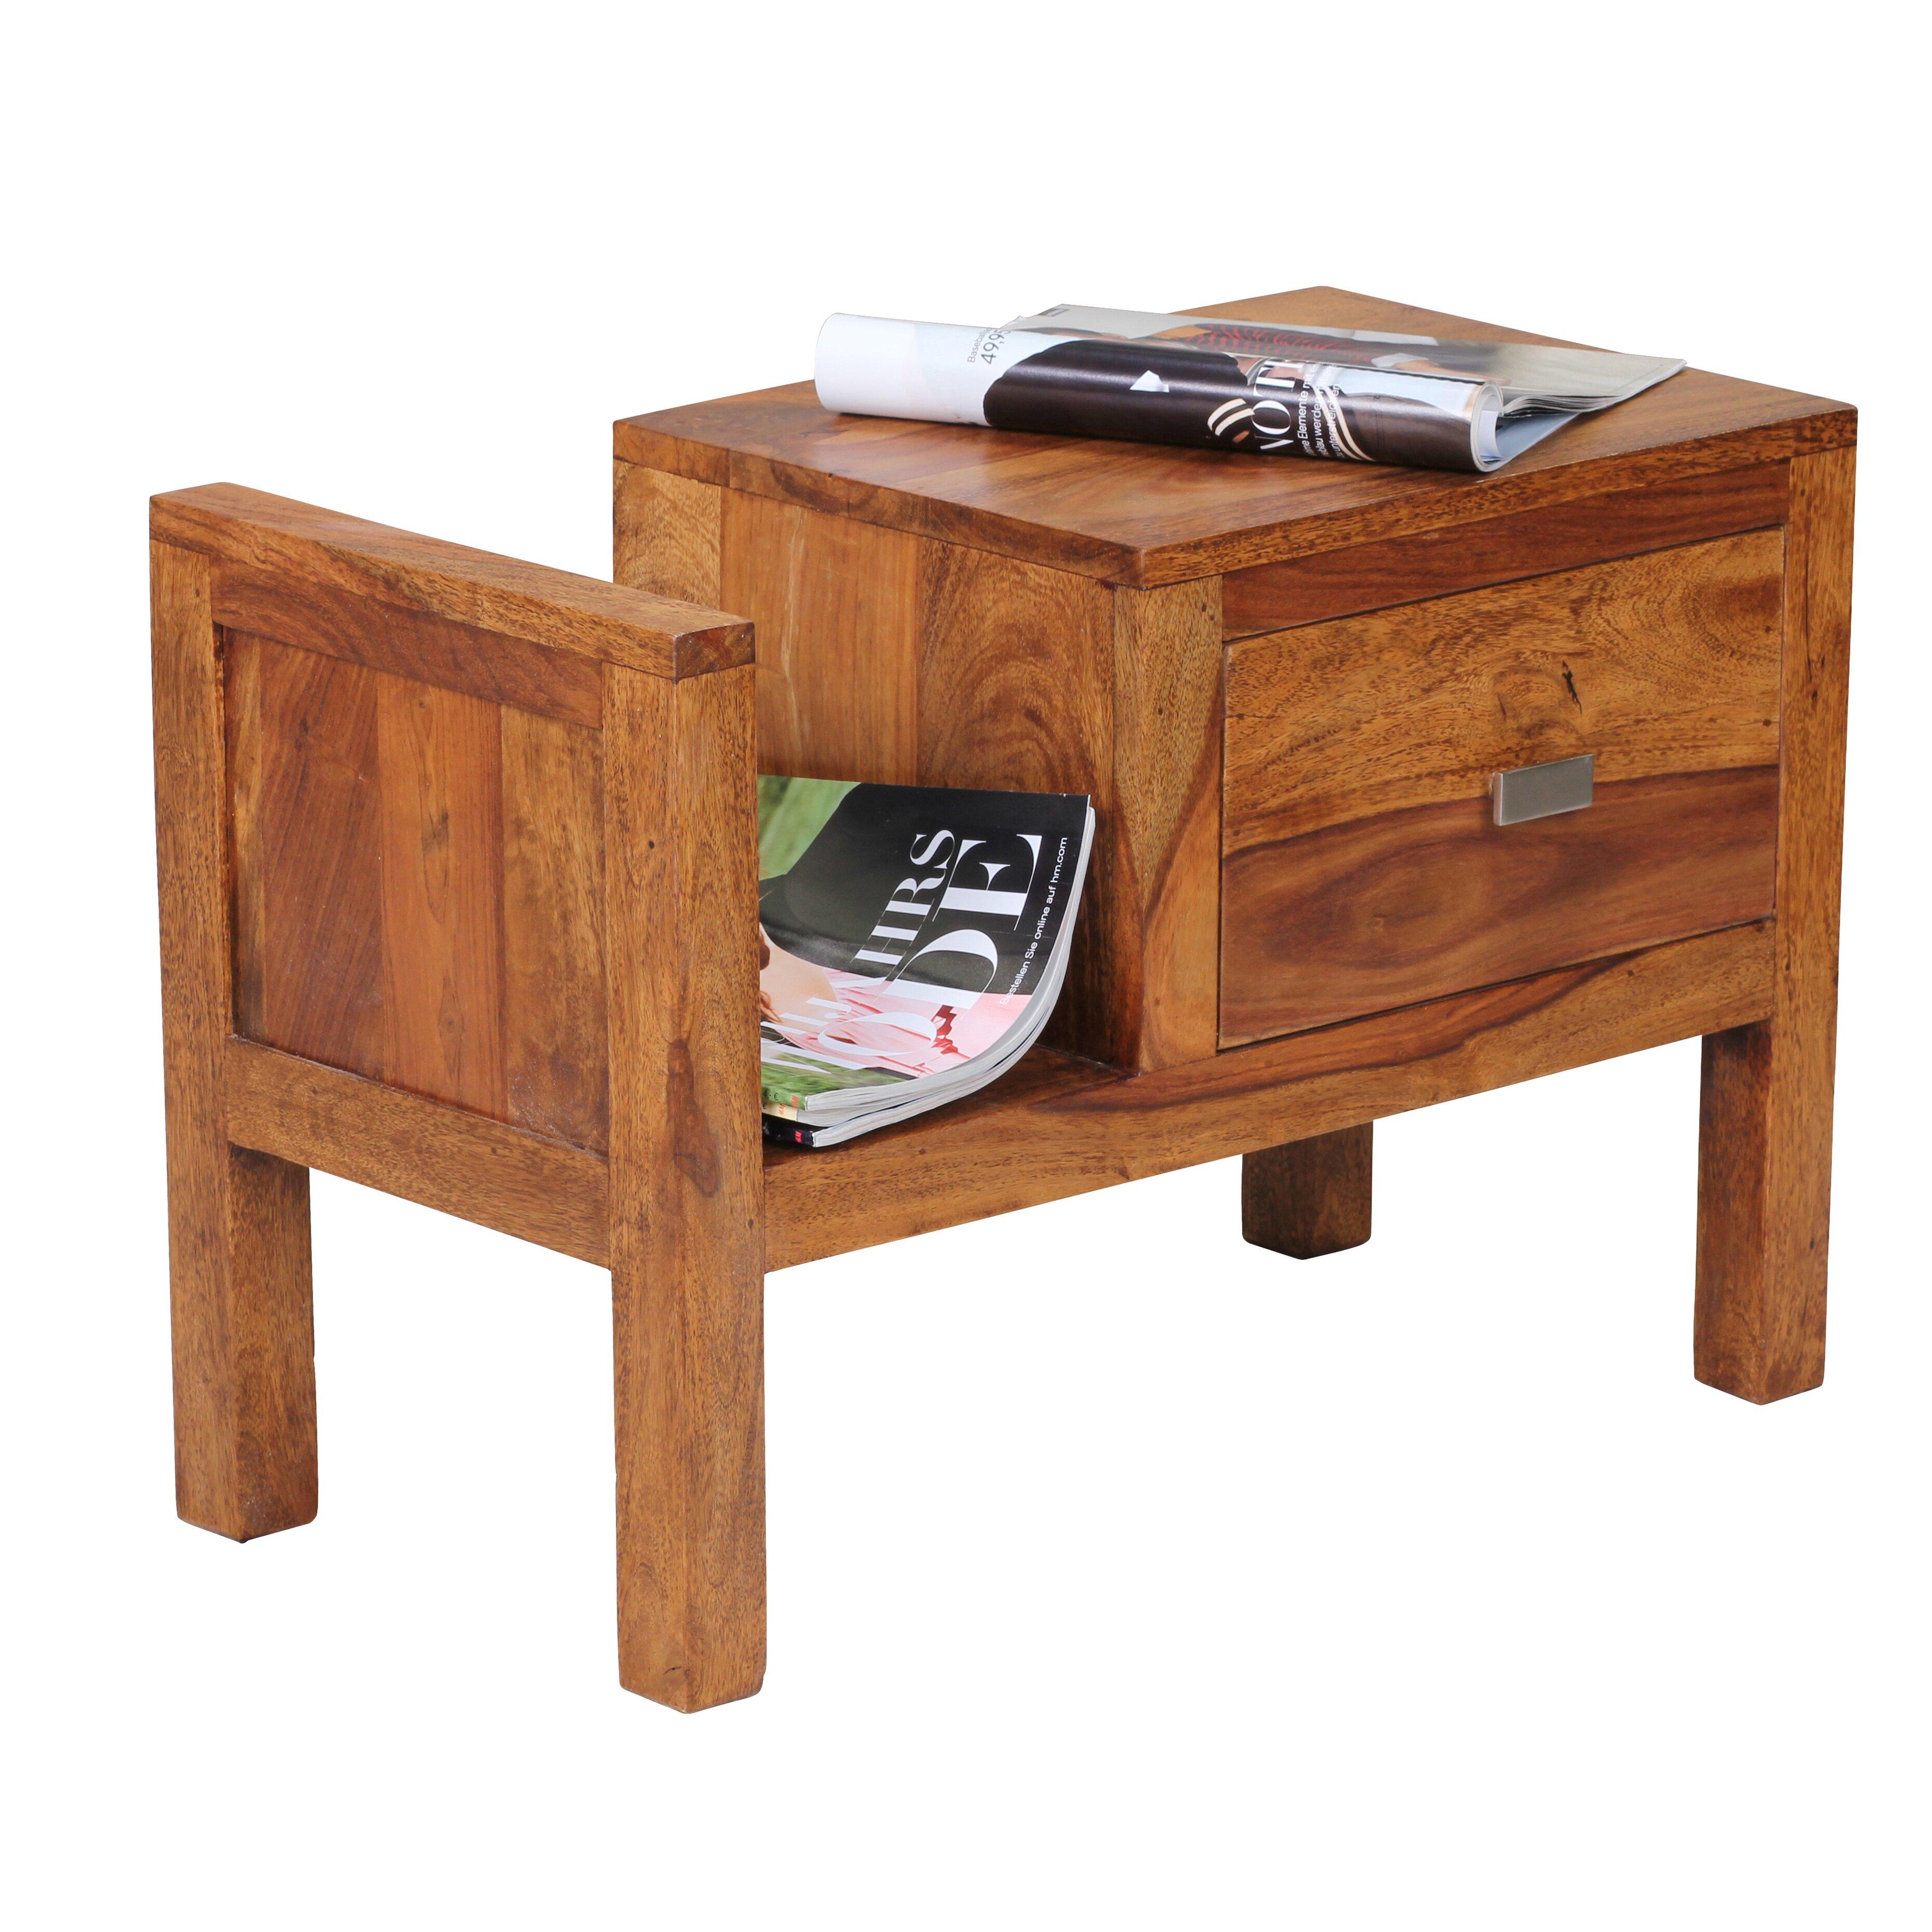 Bel tage 1 drawer bedside table reviews wayfair uk for 1 drawer bedside table